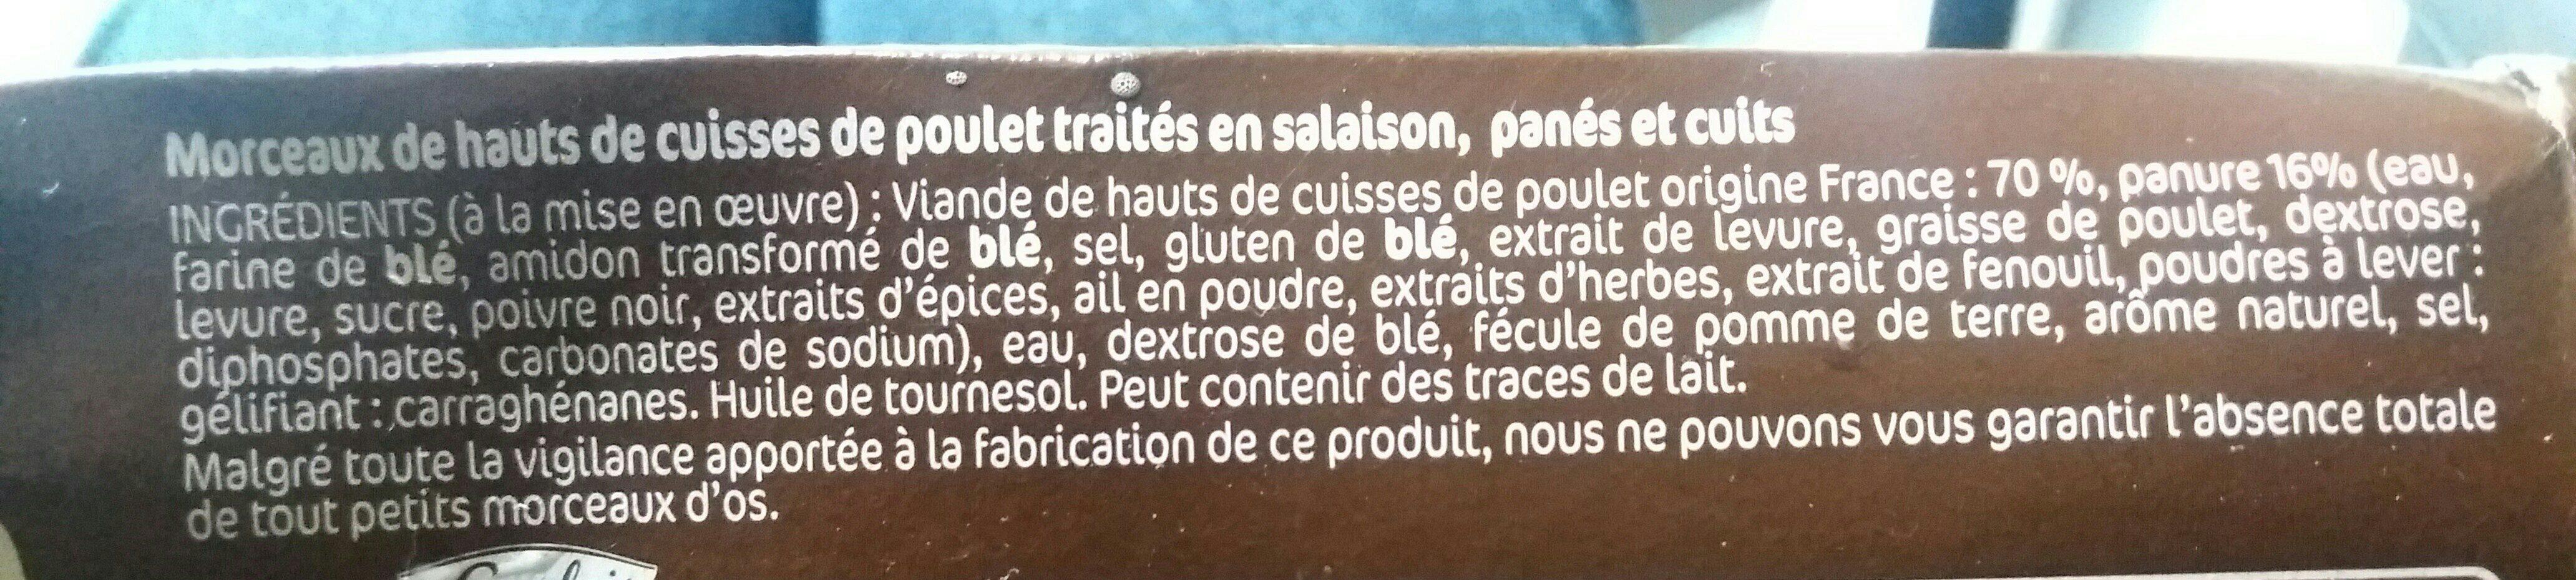 Crousty Chicken l'original - Ingrediënten - fr